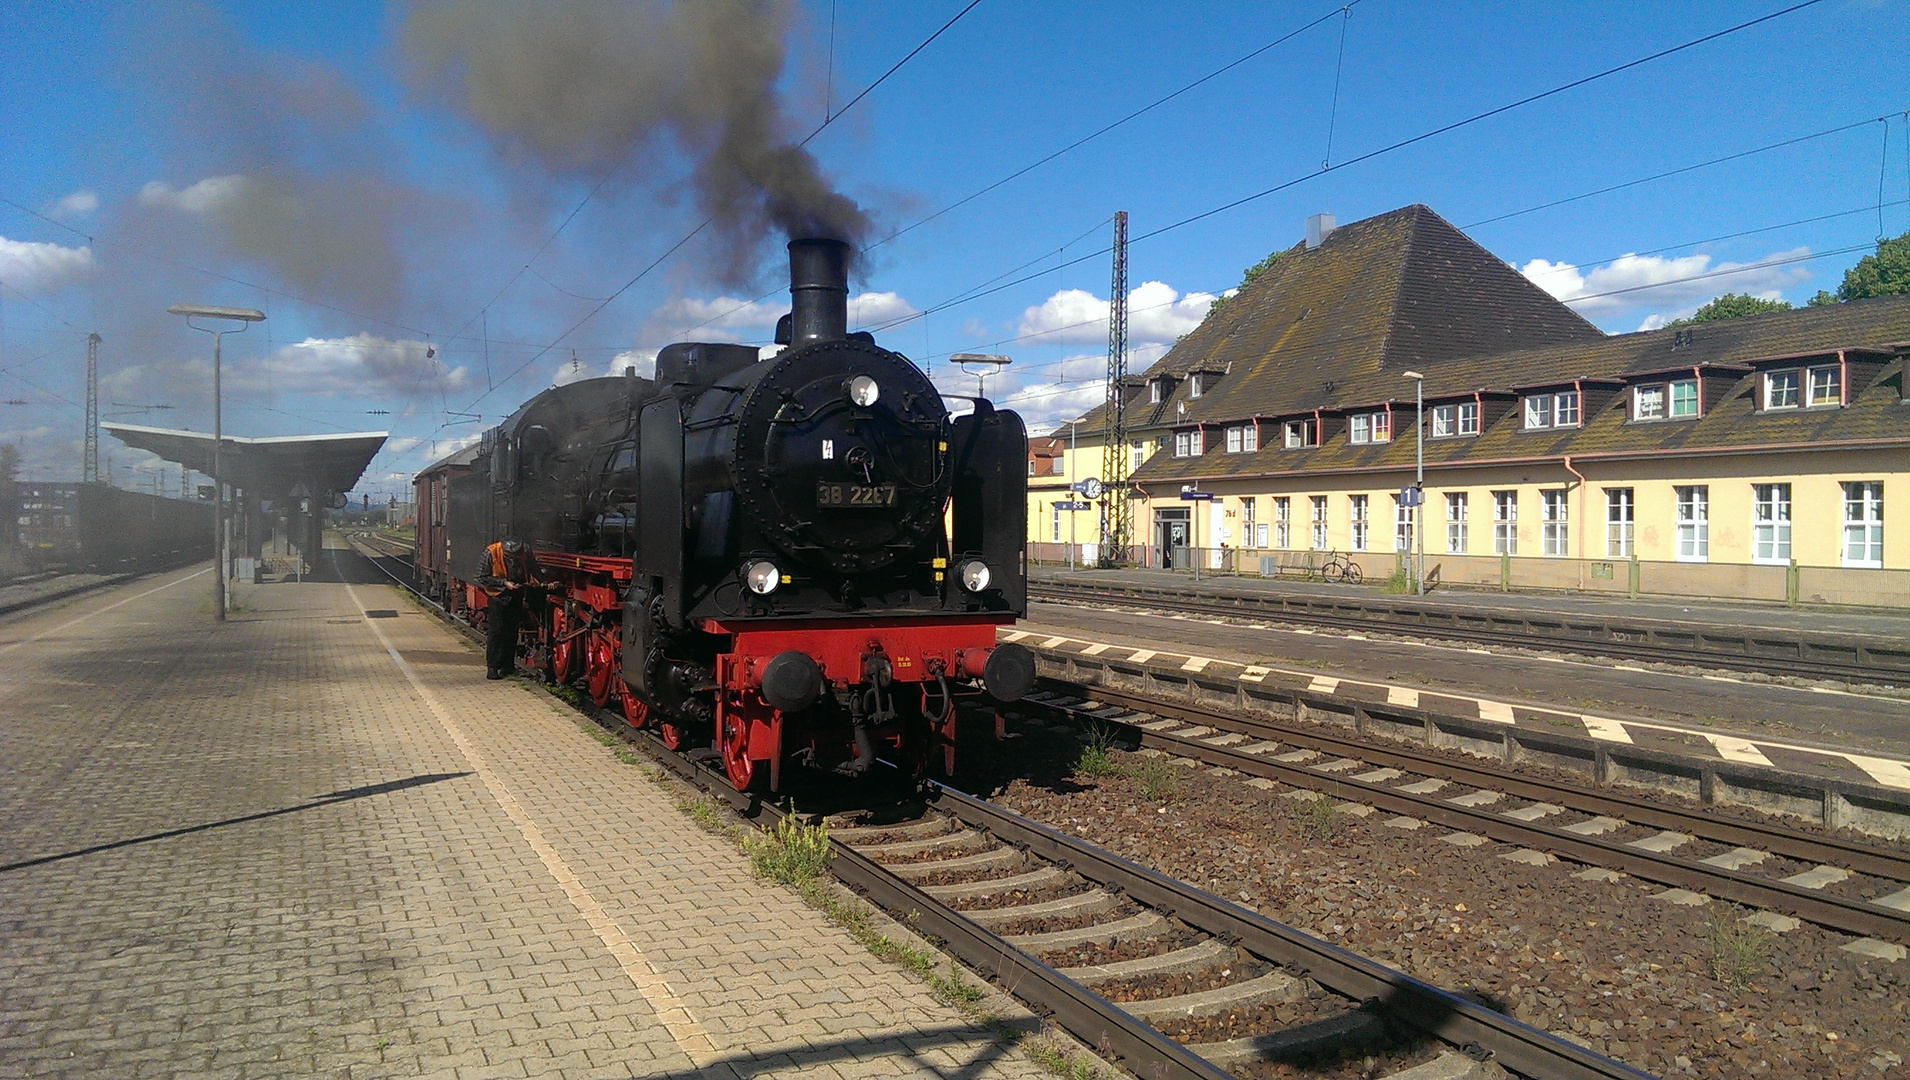 38 2267 Auf dem weg nach Heilbronn